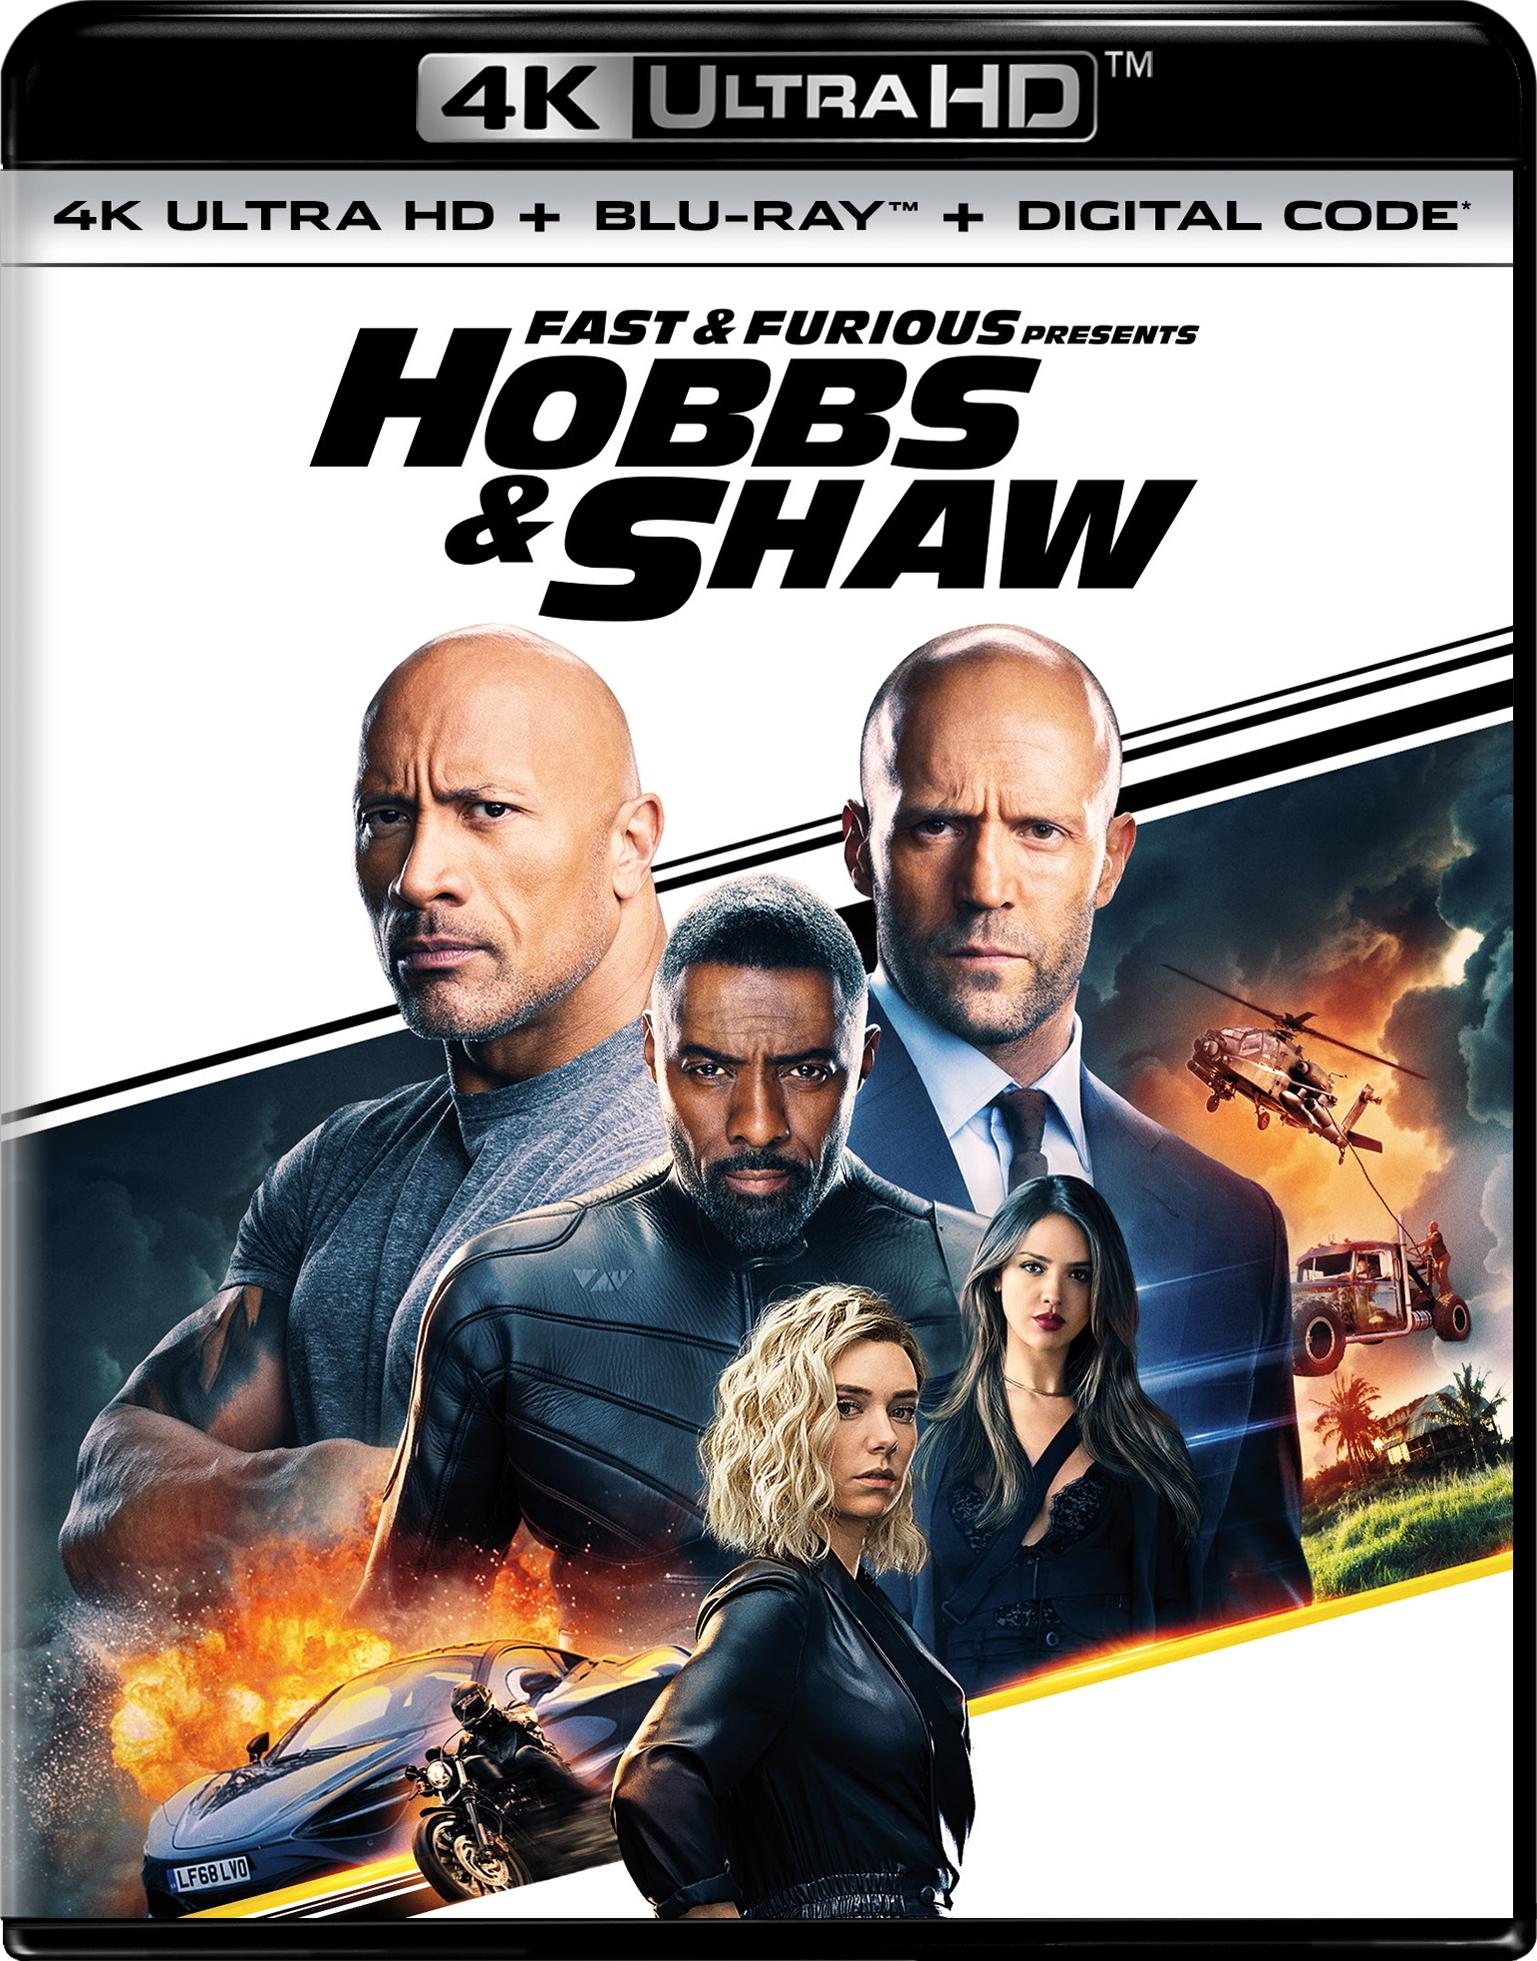 Fast & Furious Presents Hobbs & Shaw (2019) Hindi Dual Audio Blu-Ray 720p ESub 1.2GB | 600MB Download